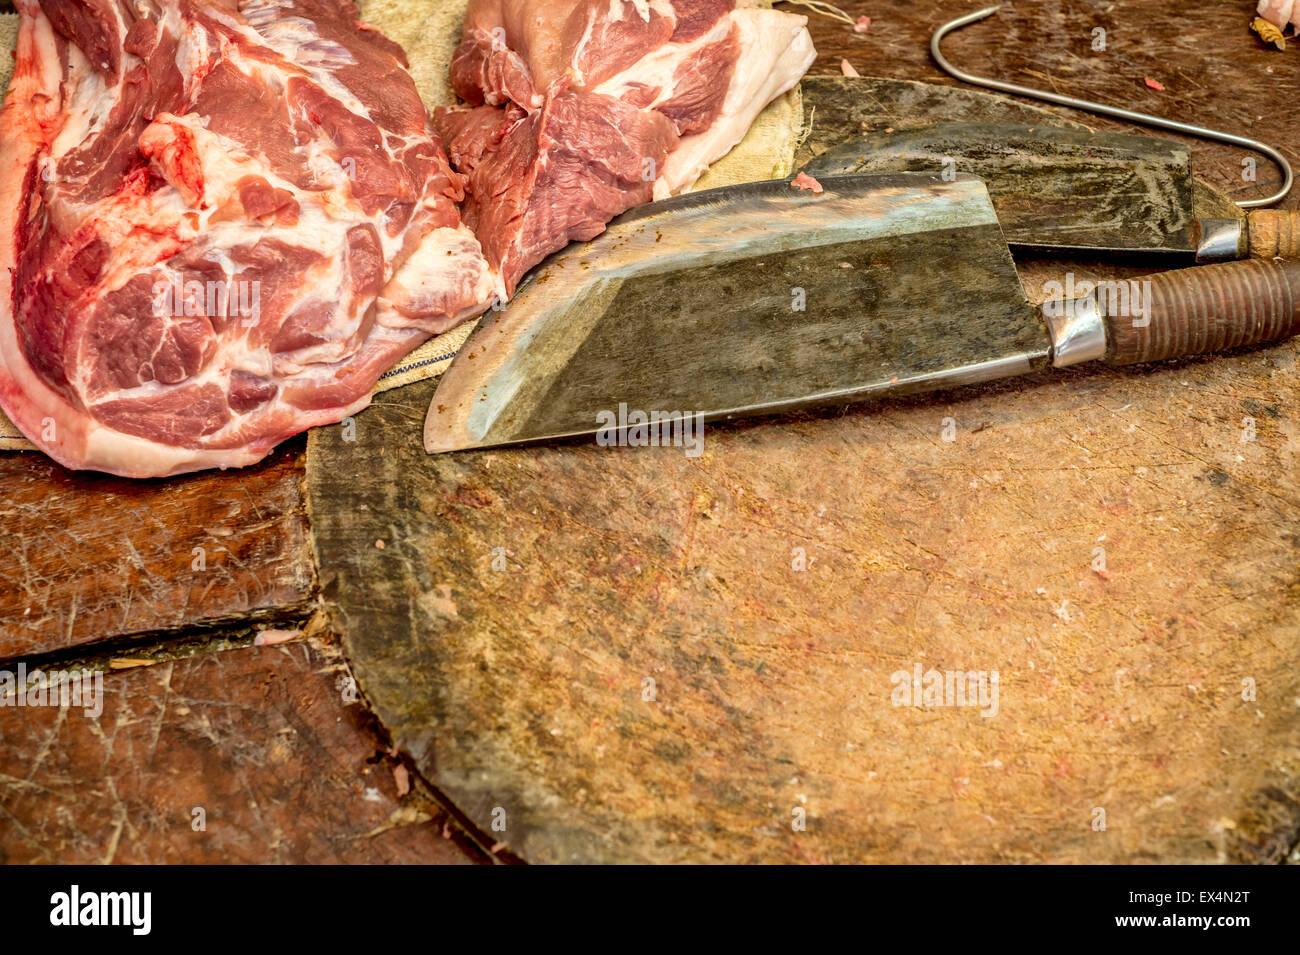 Butcher knife on cutting board Stock Photo